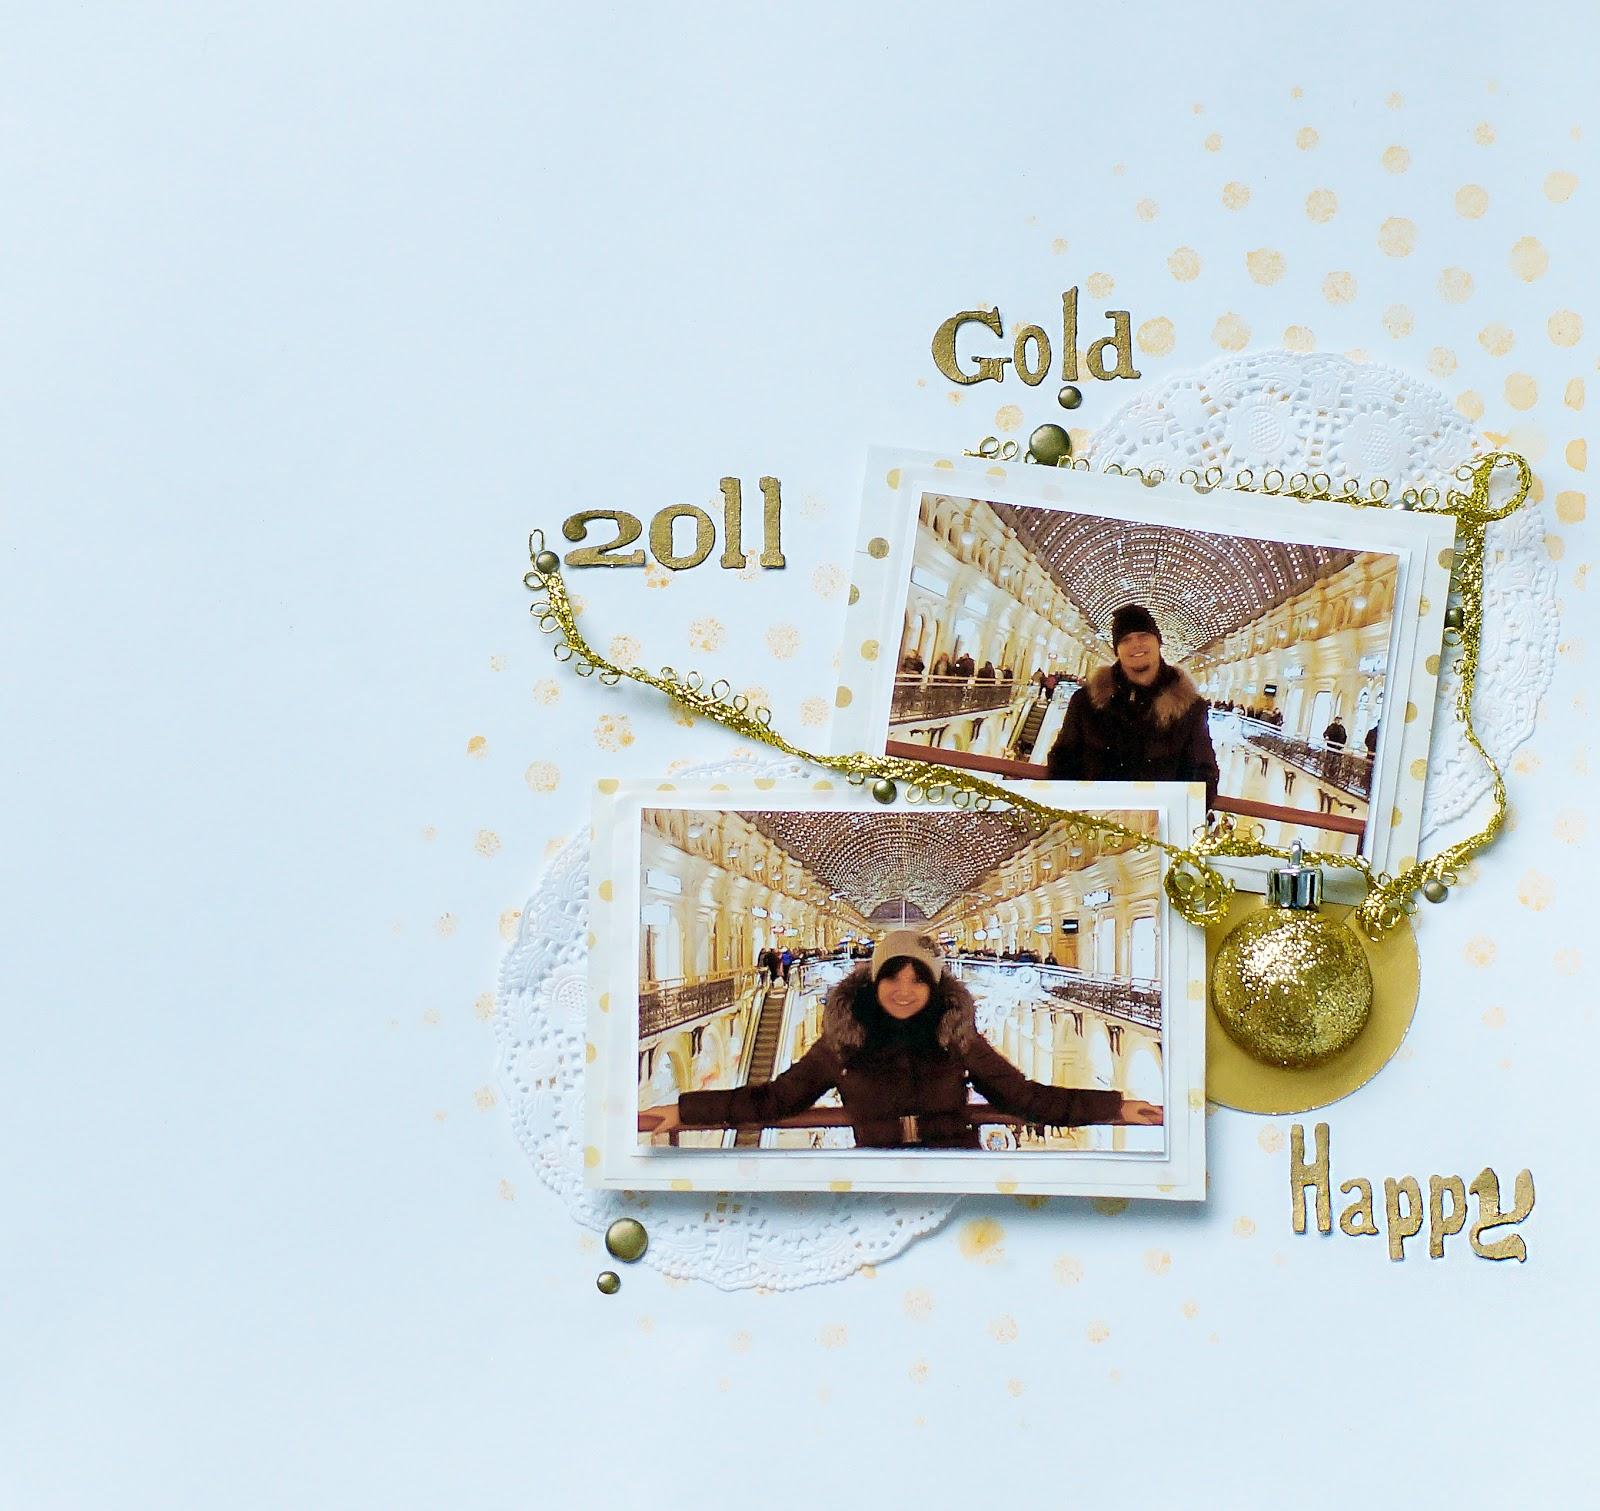 Gold, Happy, 2011 и воспоминания...